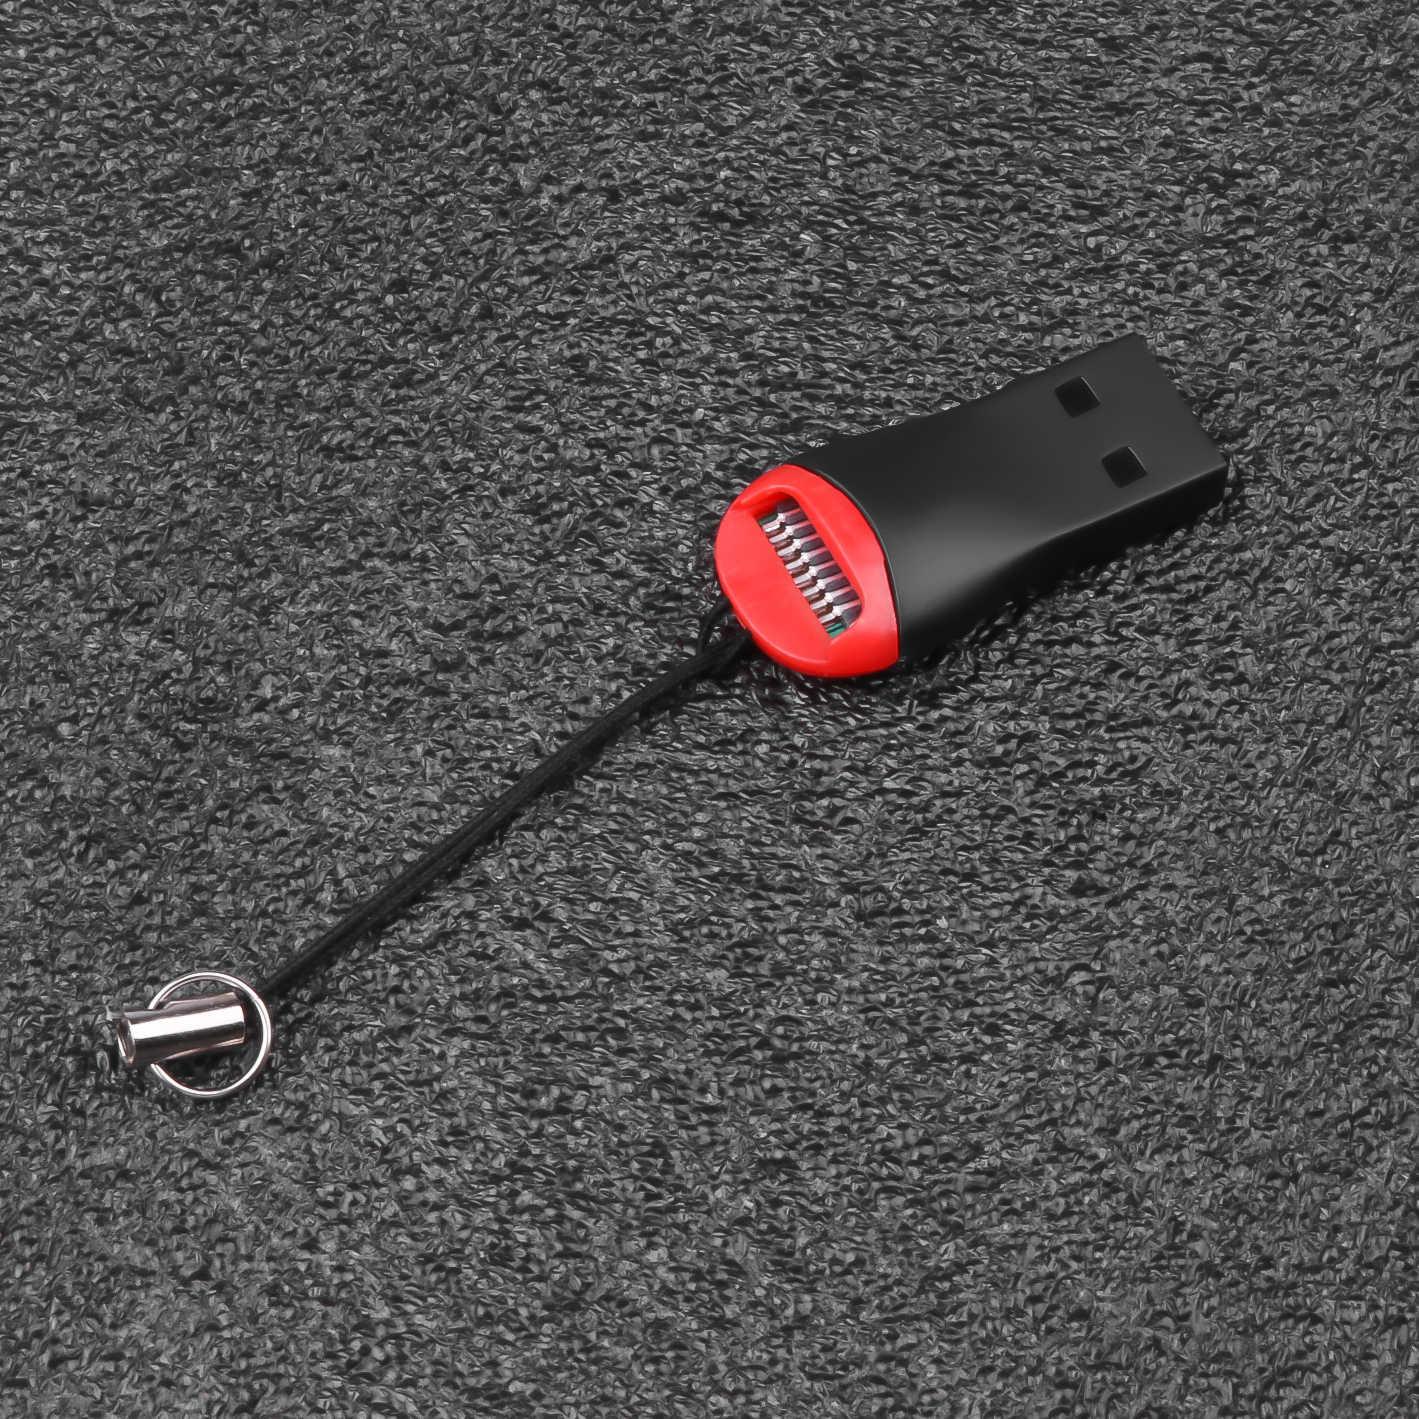 Kebidu USB 2.0 Card Reader Adaptor Internal untuk Micro Sd SDHC TF Flash Memory Card Reader Mini Adaptor untuk Laptop